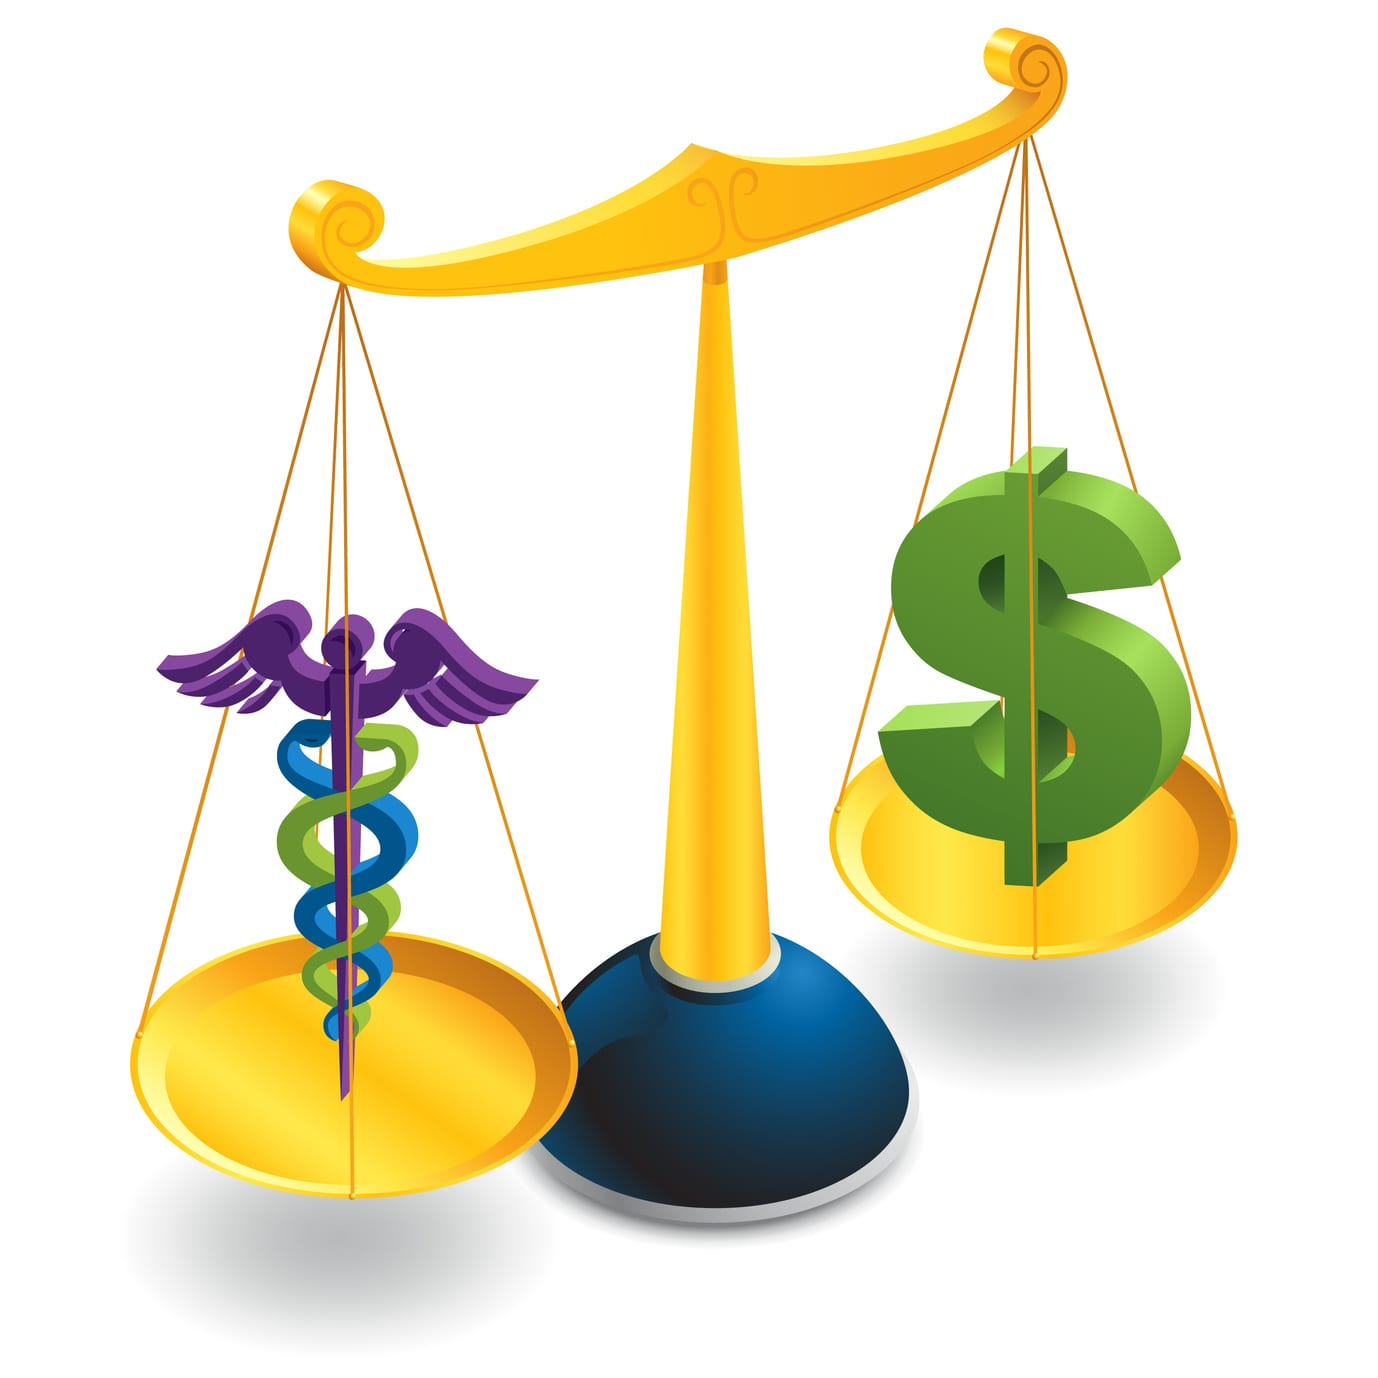 Dollar symbol balances medical symbol on scales.